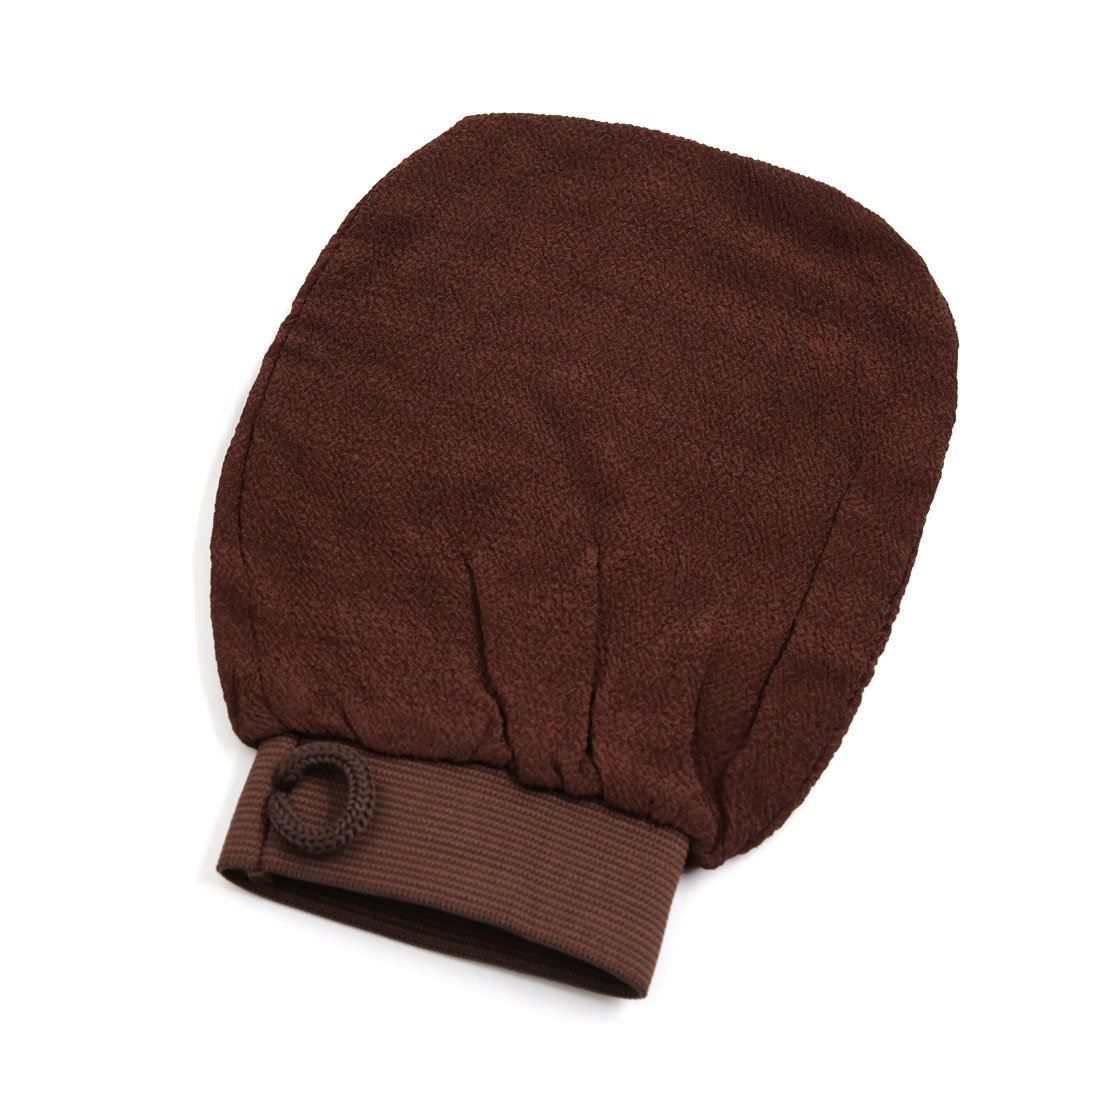 uxcellBath Shower Sauna Dead Hard Skin Care Exfoliator Exfoliating Massage Mitt Back Scrubber Glove a17032900ux1120